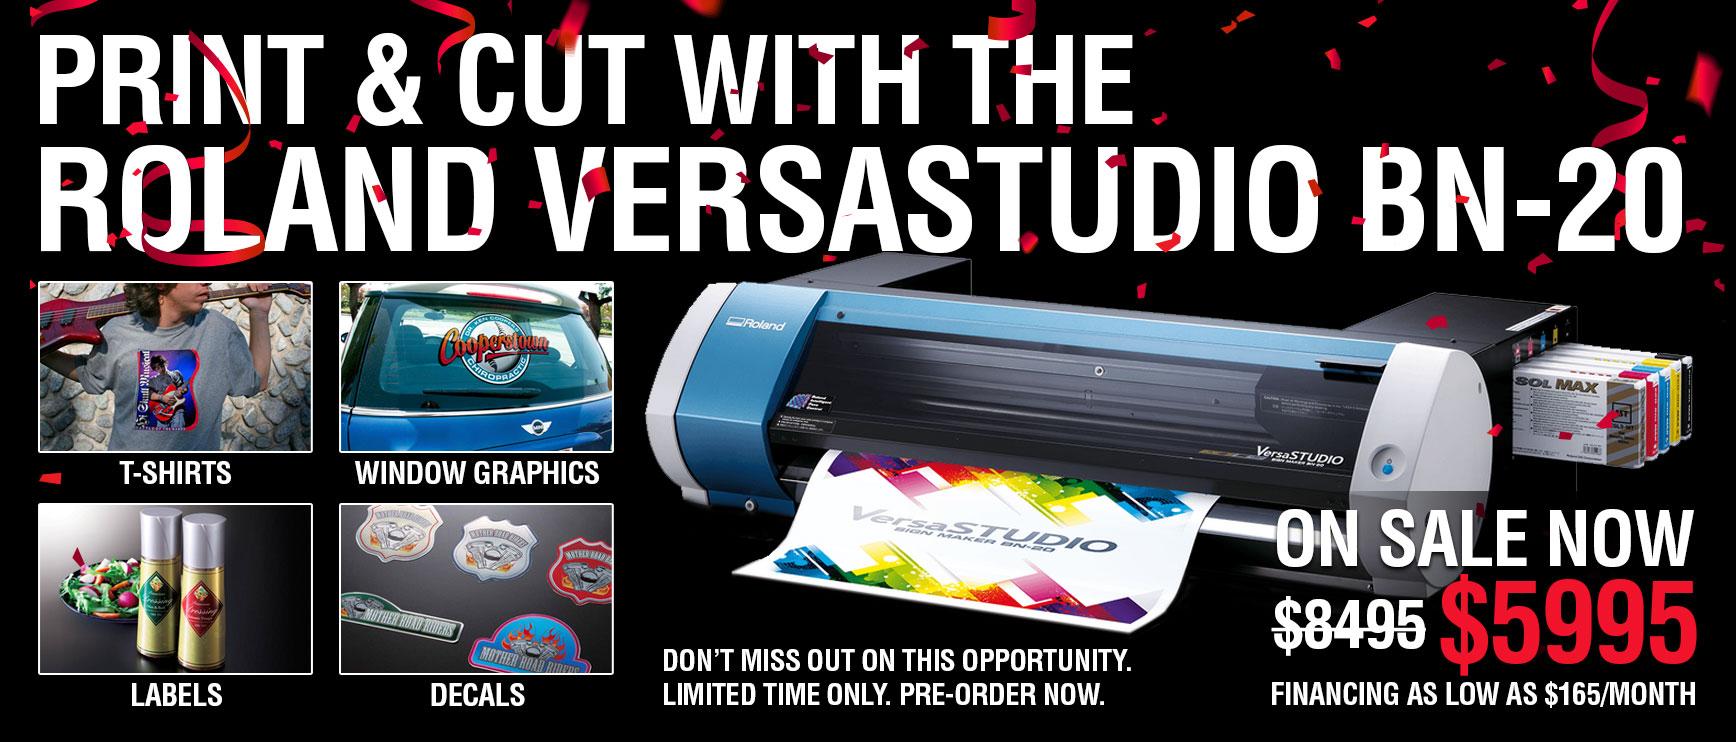 Print & Cut With The Roland VersaStudio BN-20